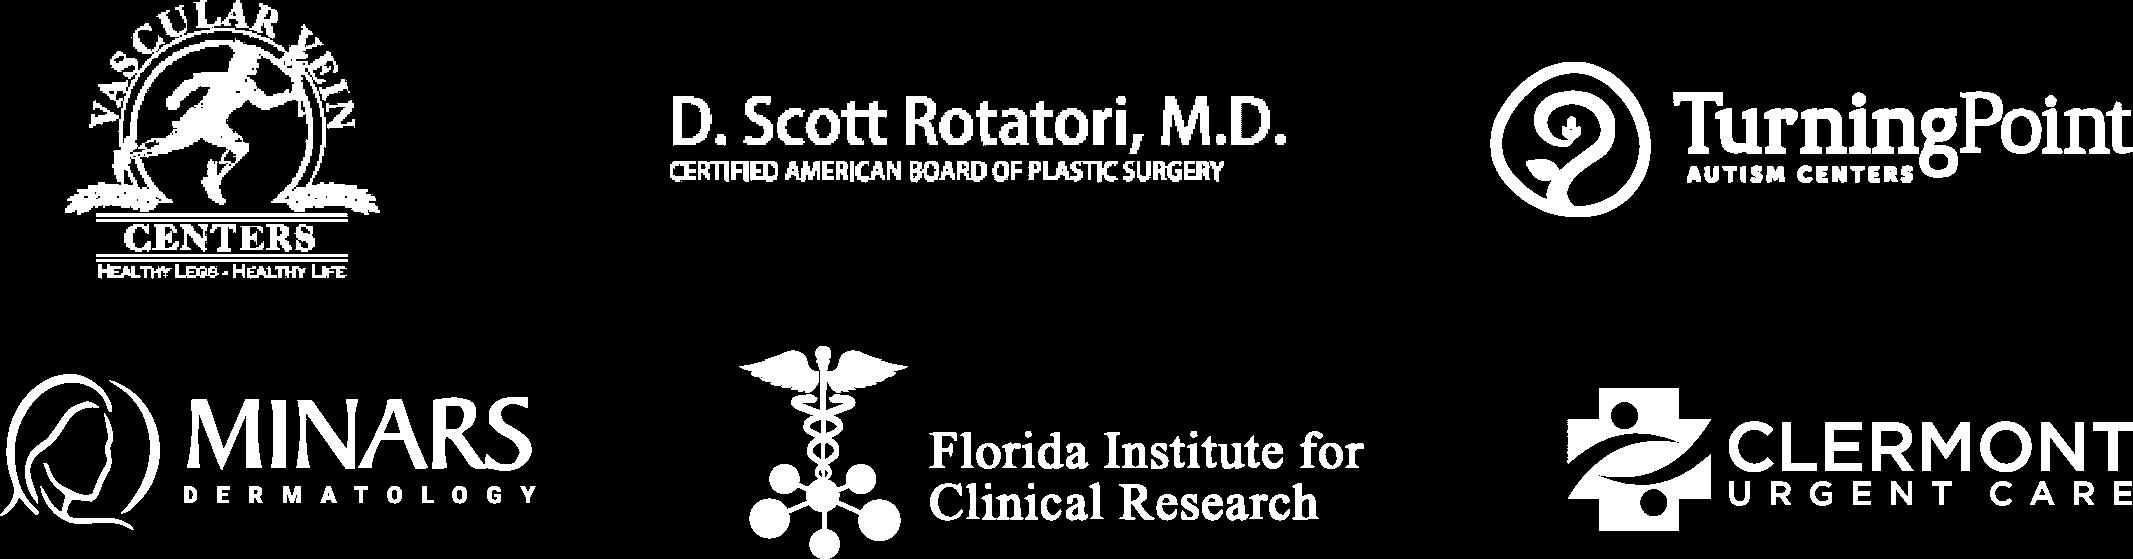 Logos Of ROAR! Medical Clients